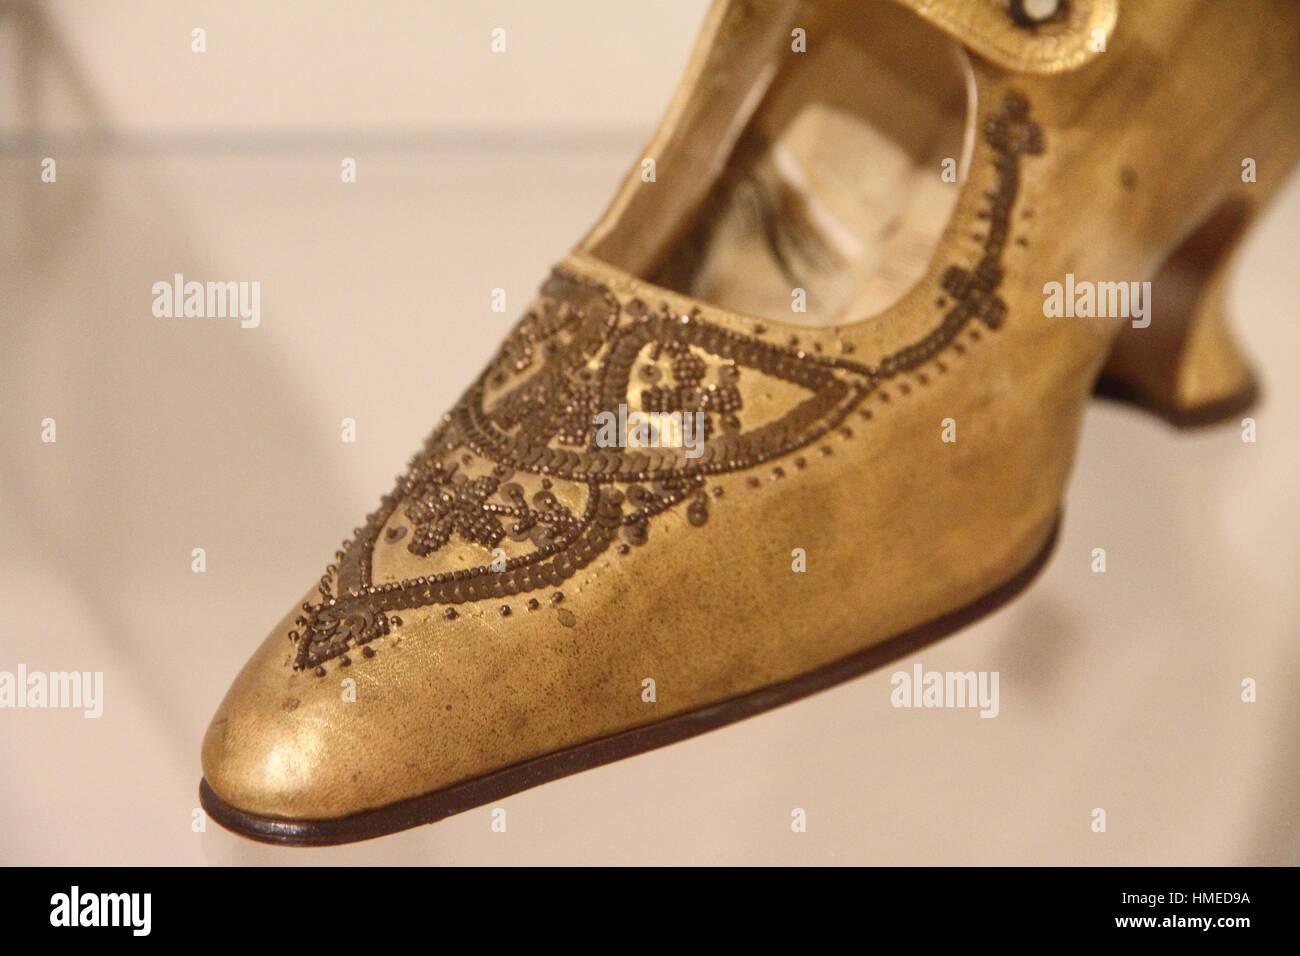 0426fa81a Footwear Museum Imágenes De Stock   Footwear Museum Fotos De Stock ...